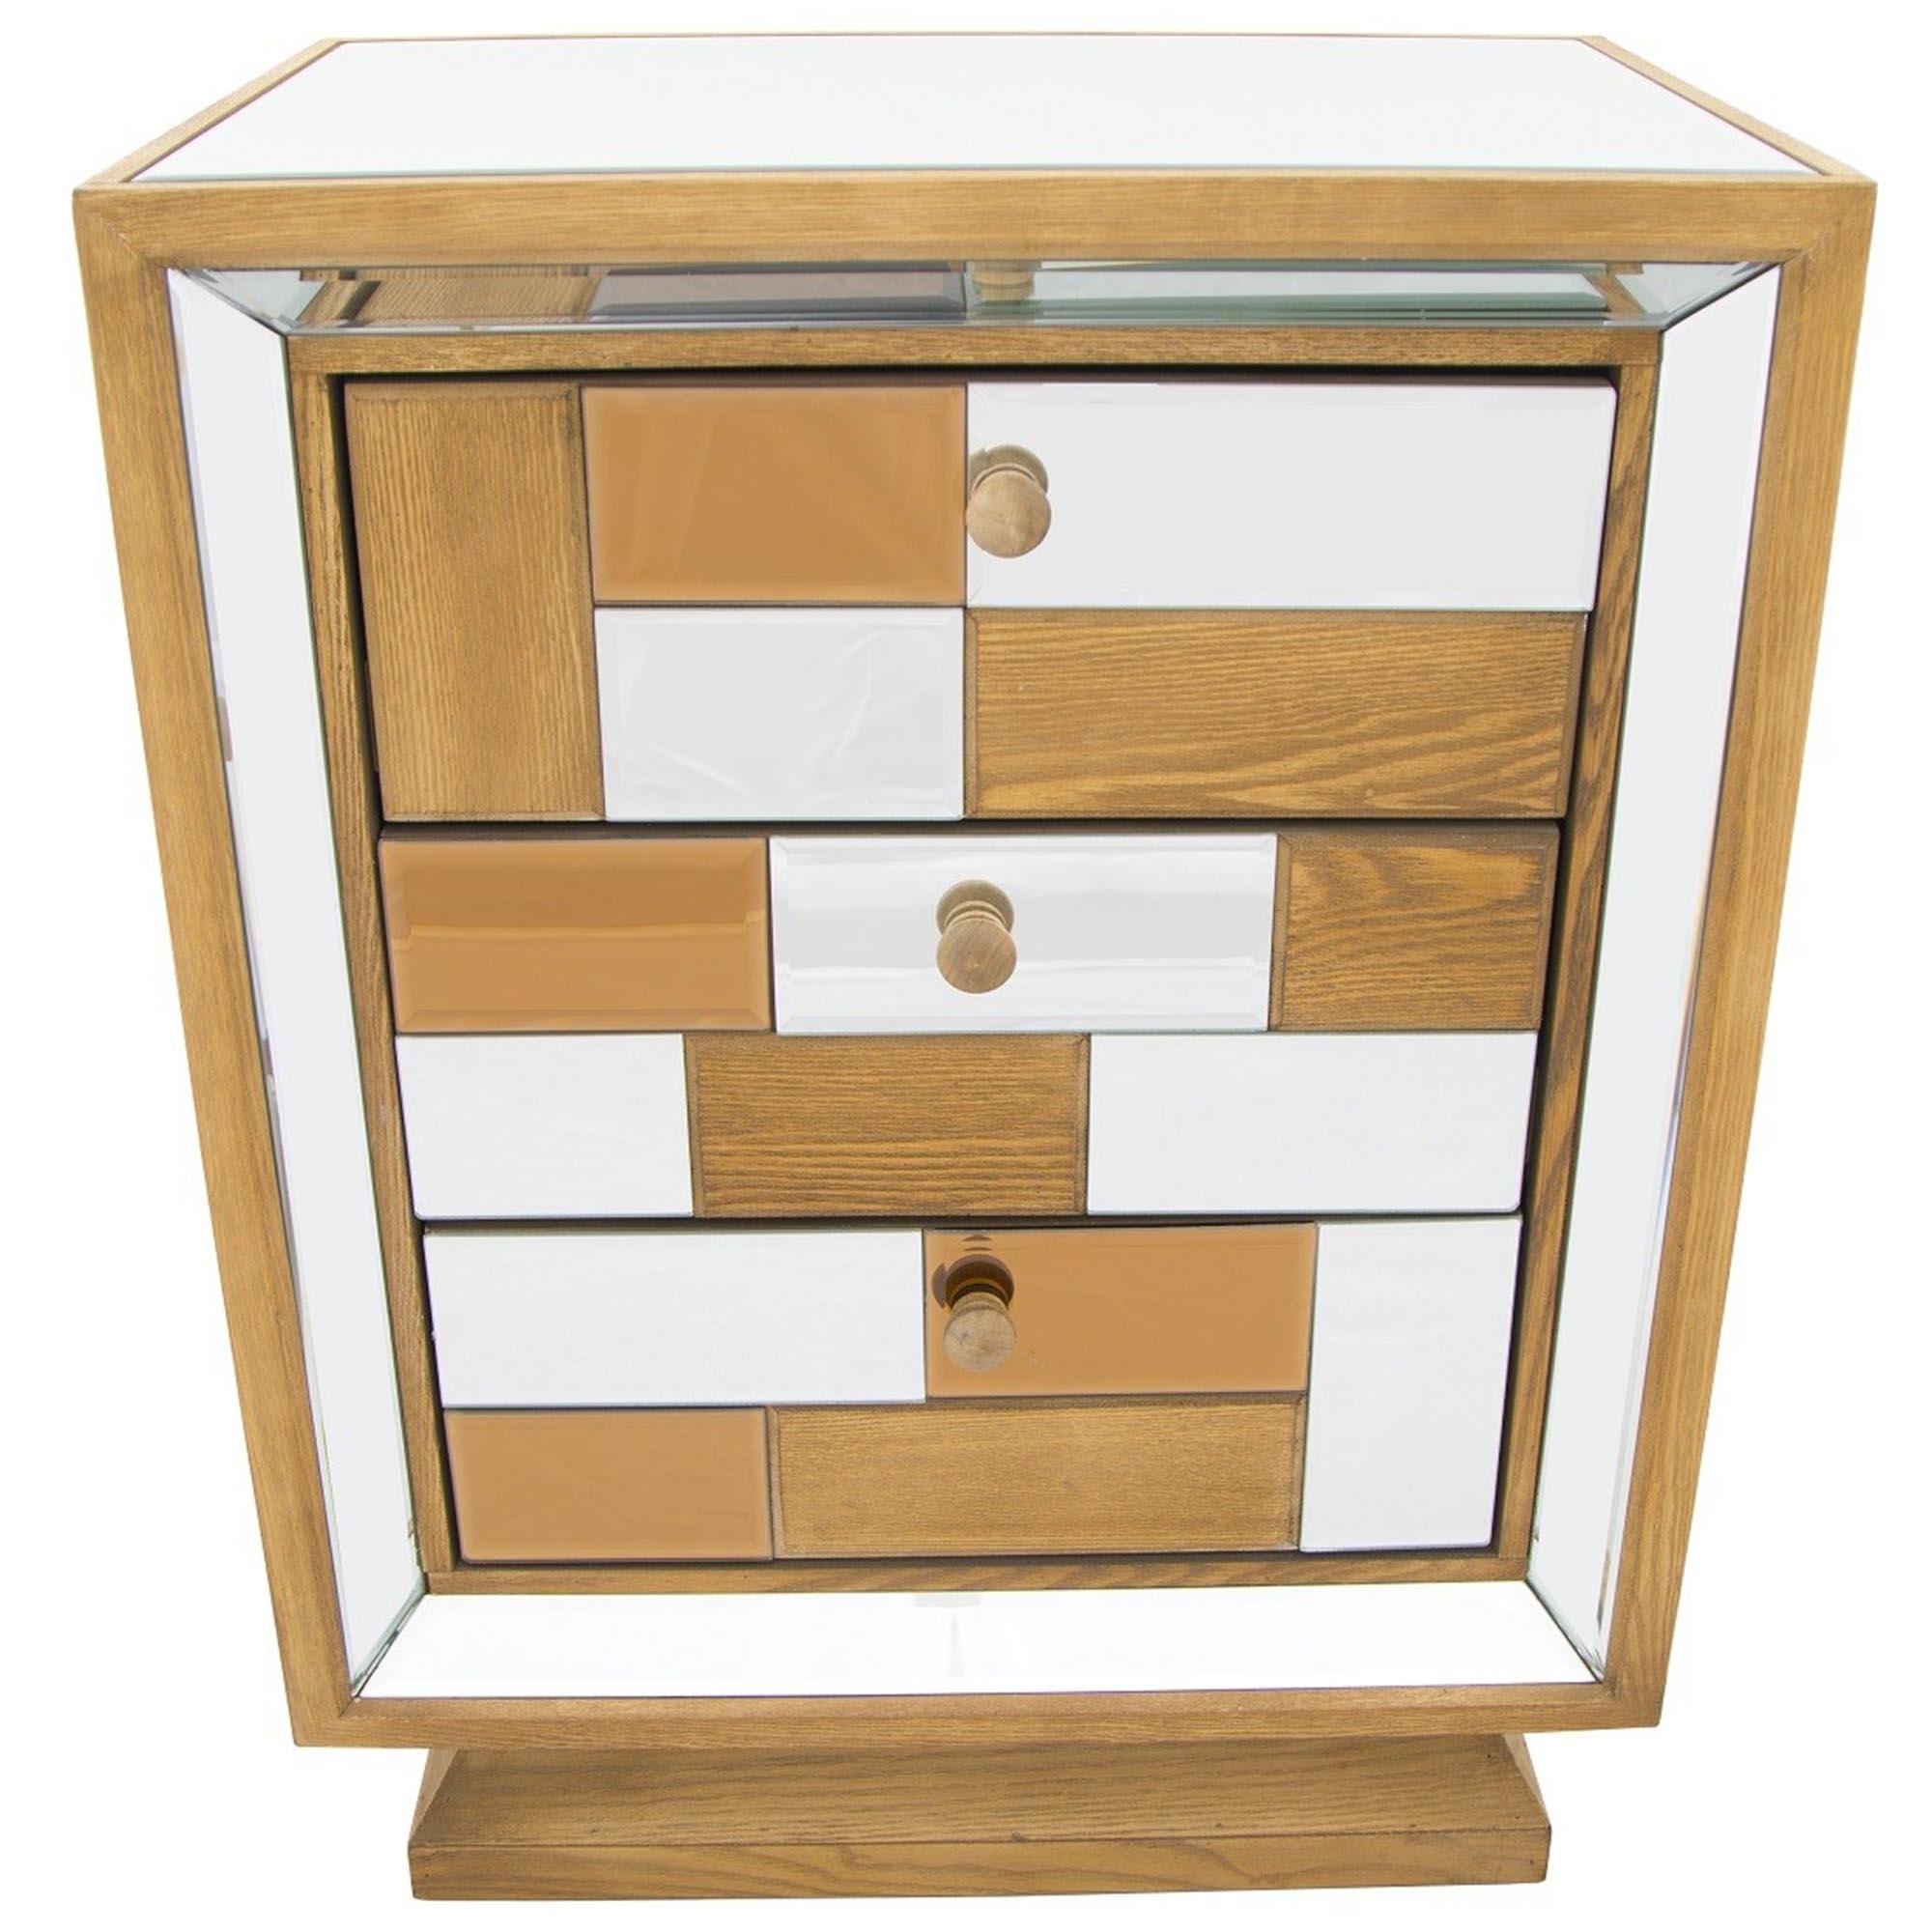 Bronze Mirrored Bedside Cabinet